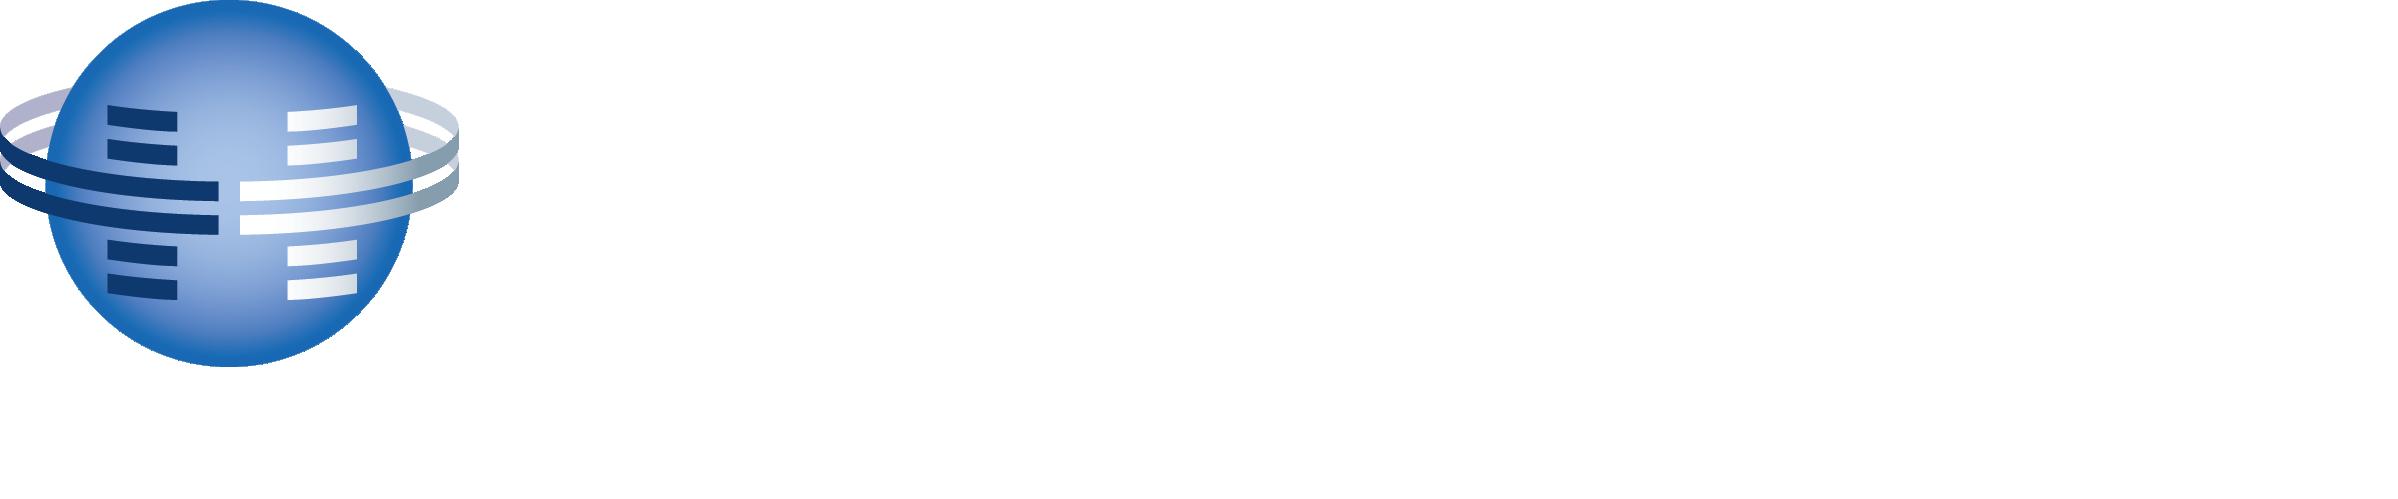 HT_Workforce_logo_hor_white_color_globe